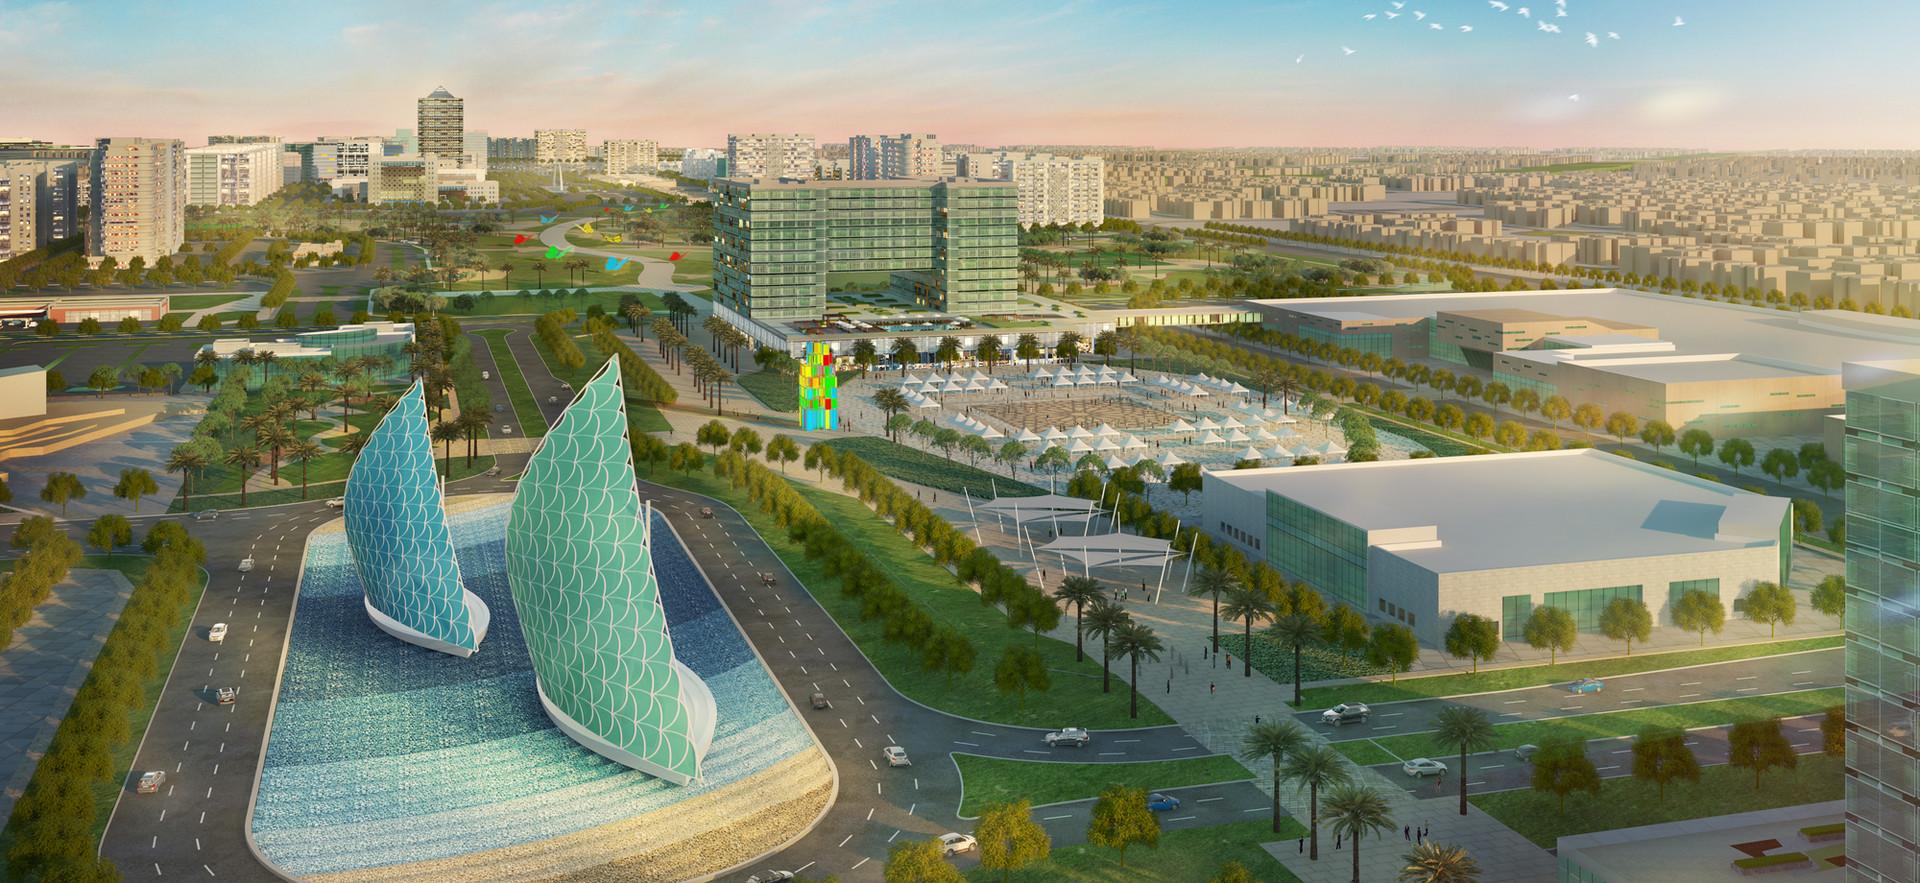 Sabah Al-Ahmad City, Kuwait